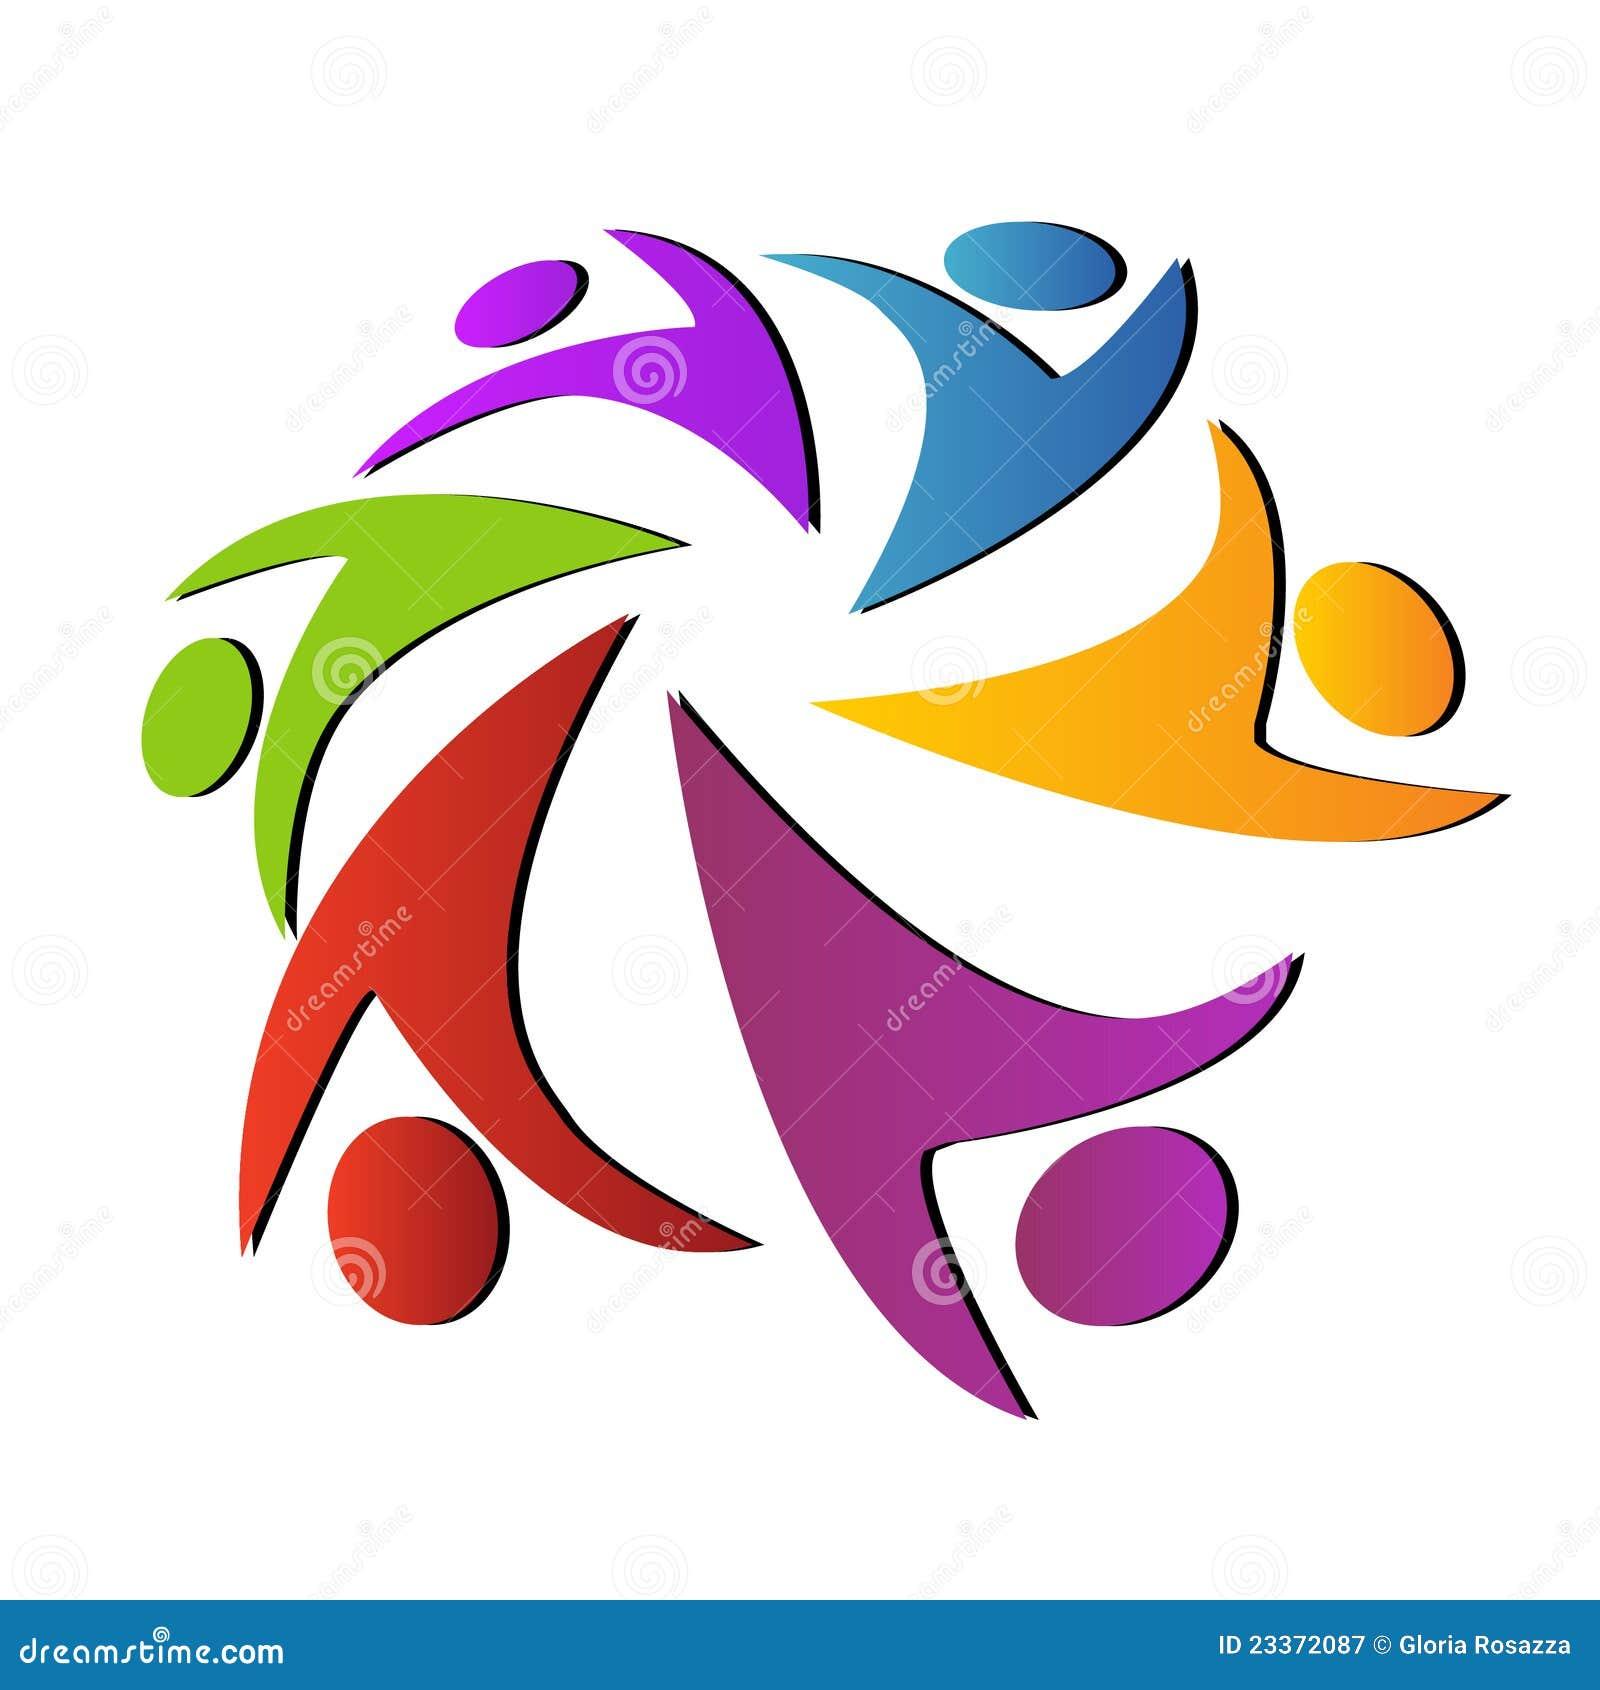 Teamwork Unity Logo Royalty Free Stock Photography - Image ...